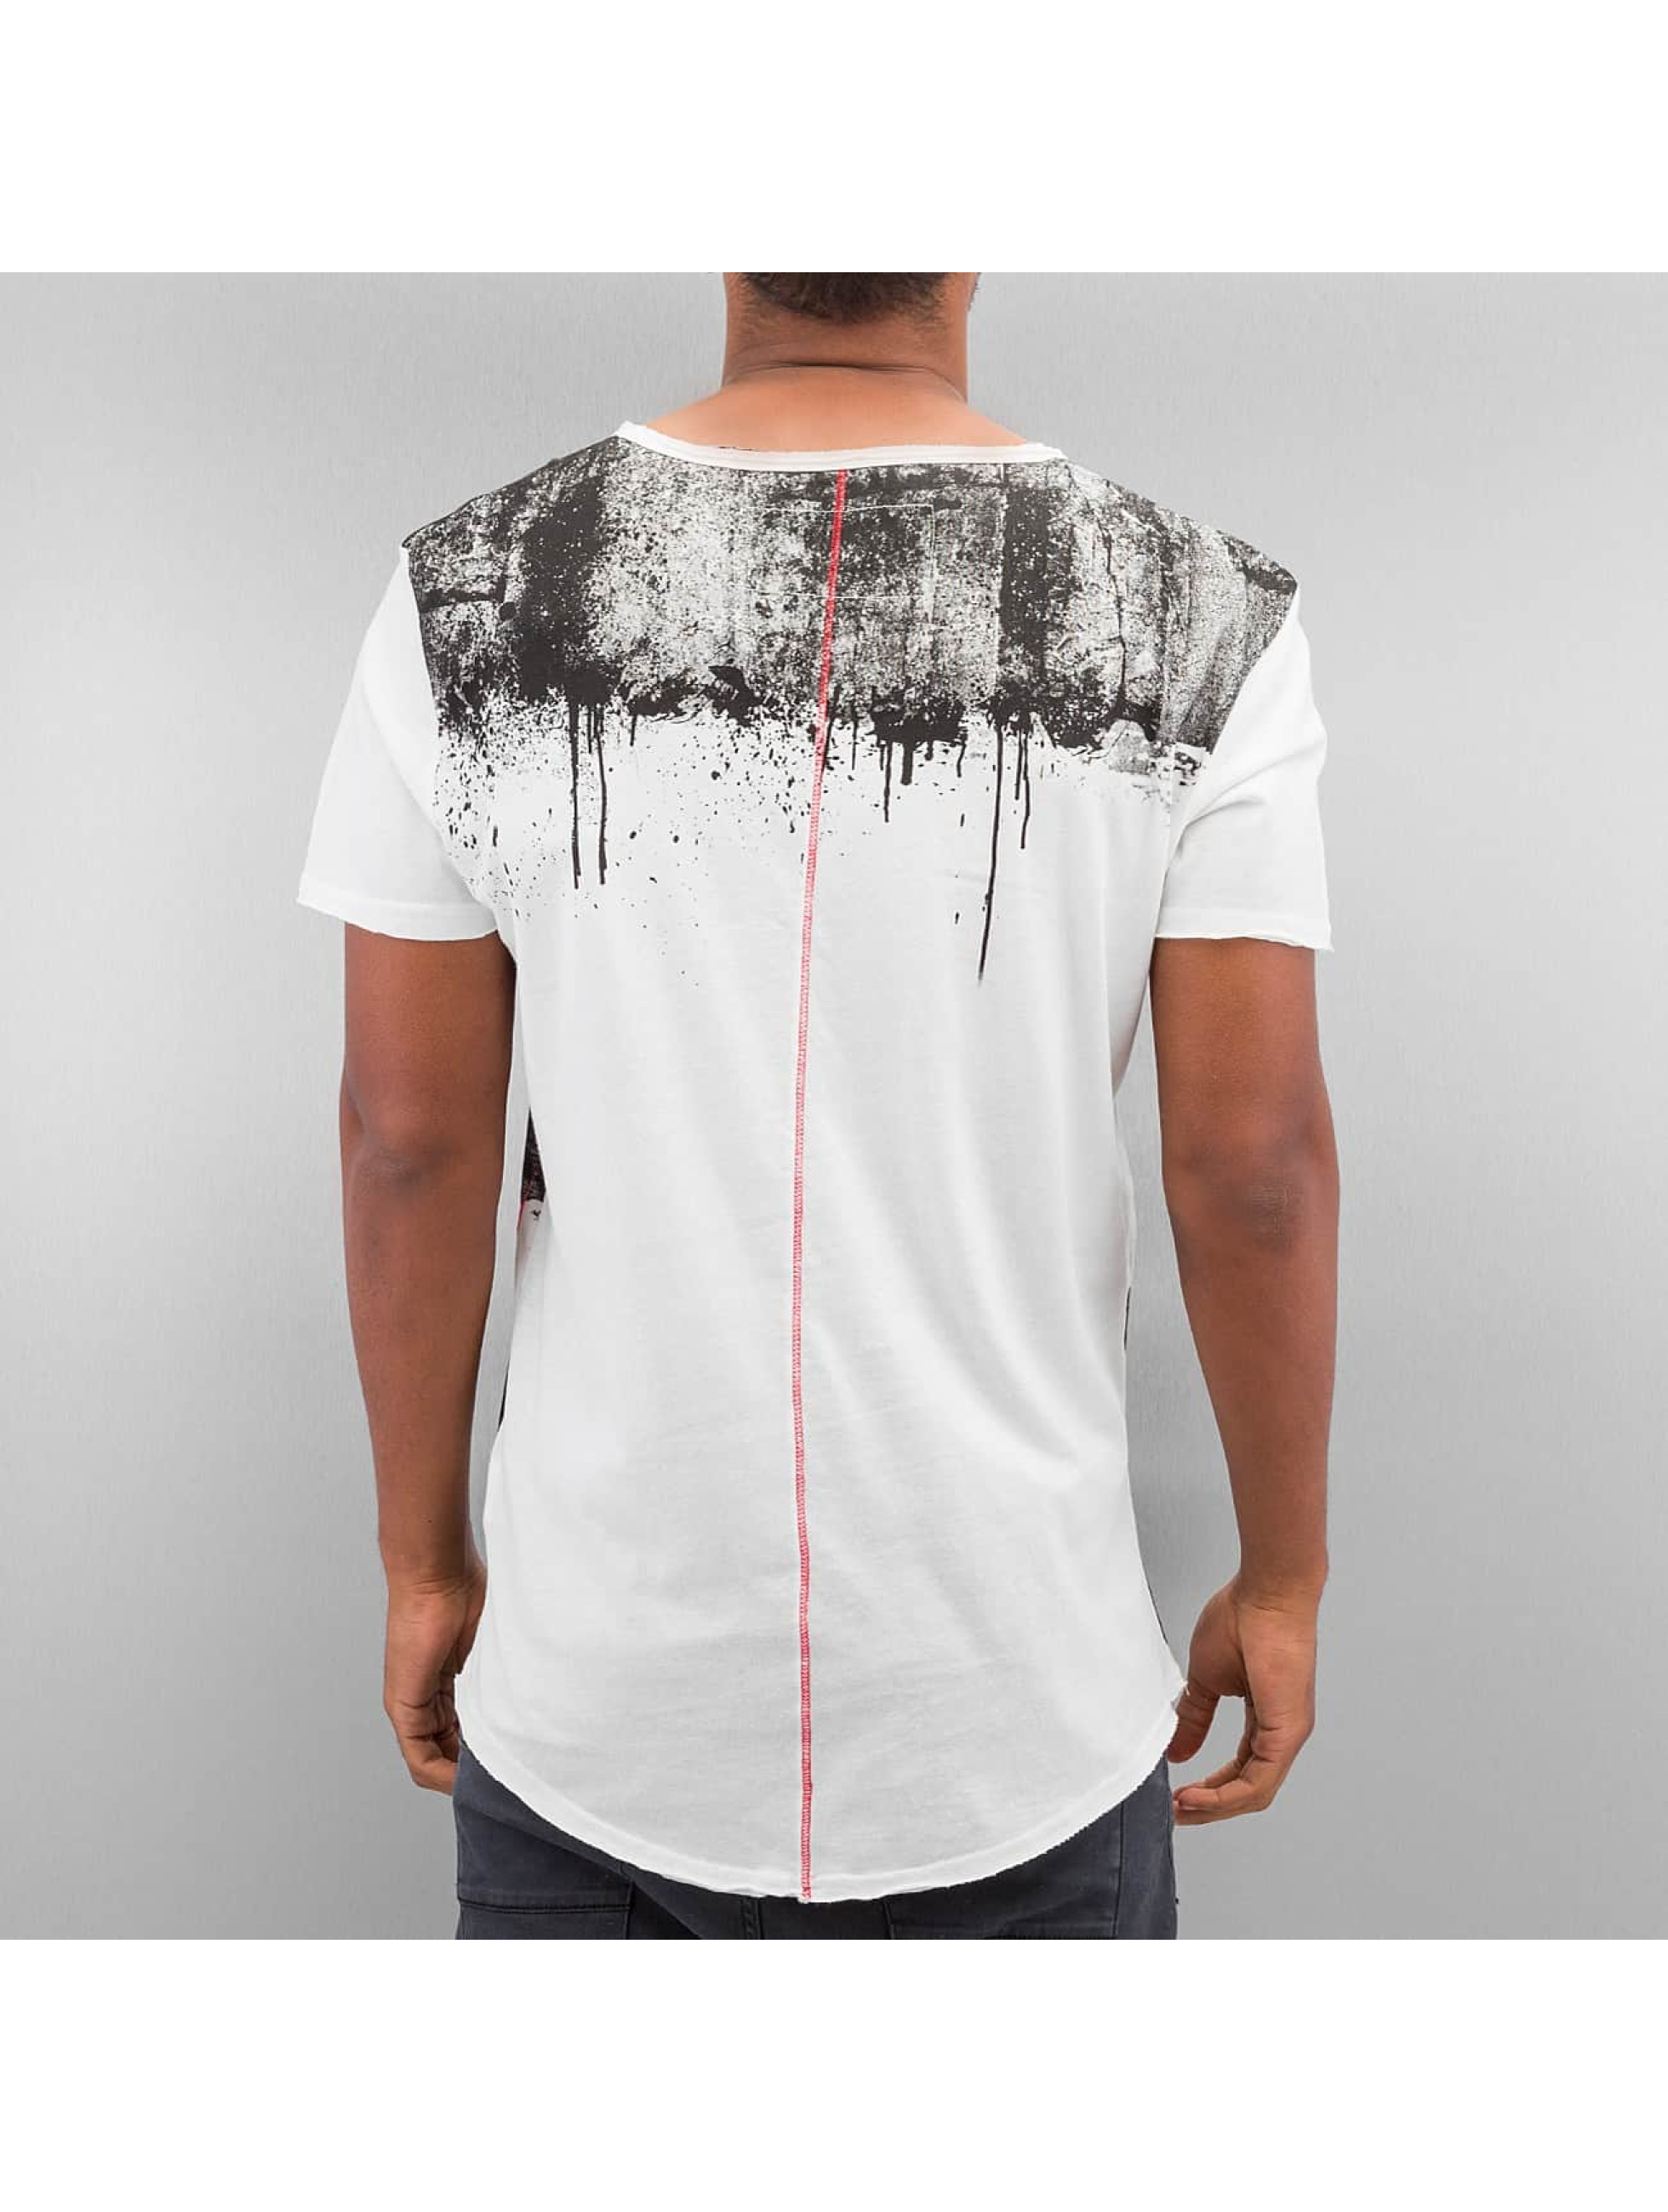 trueprodigy t-shirt Stripe Printed grijs